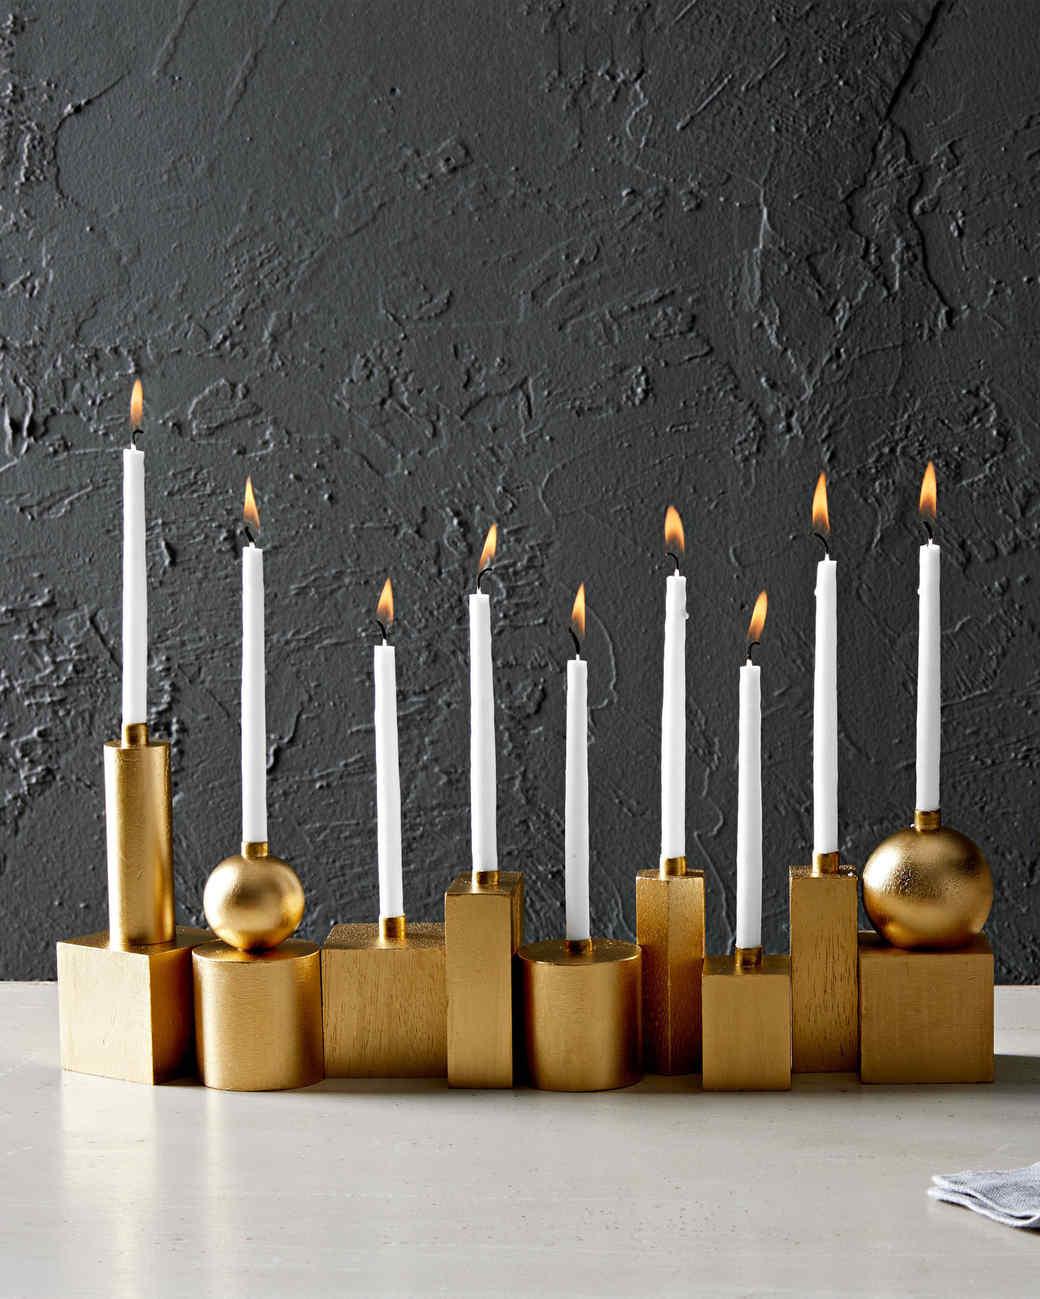 gilded wooden blocks for a Hanukkah menorah